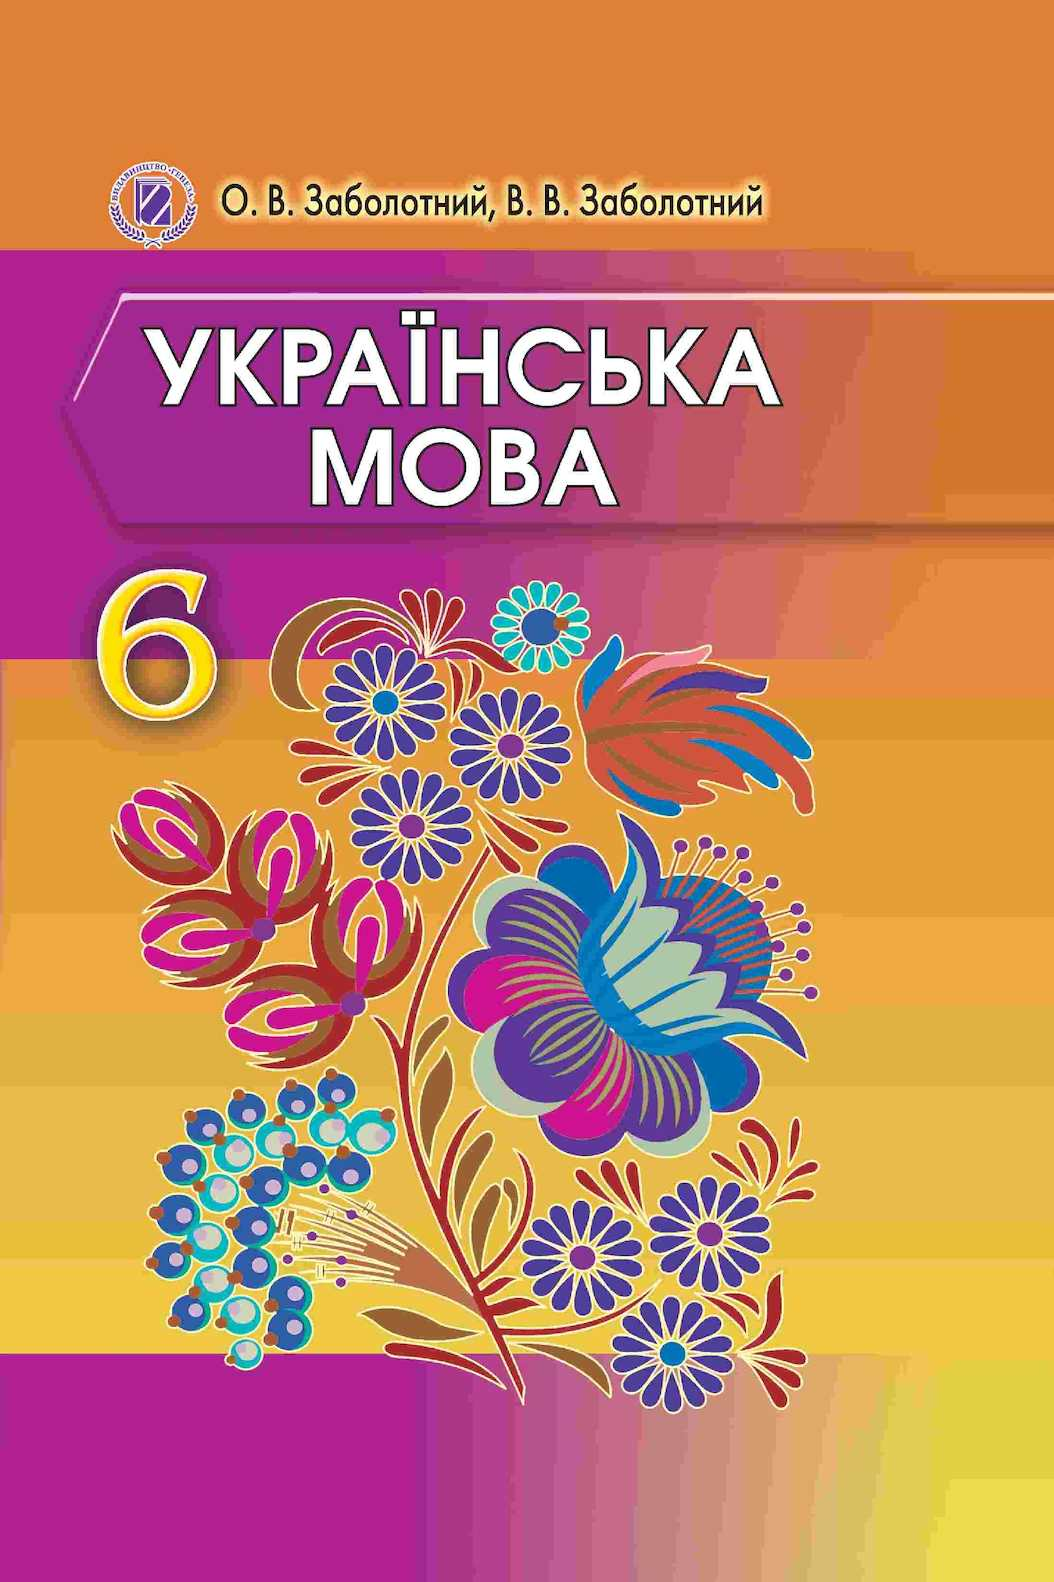 Calaméo - 6 клас. Заболотний. Українська мова. 2014 44049d68d201d